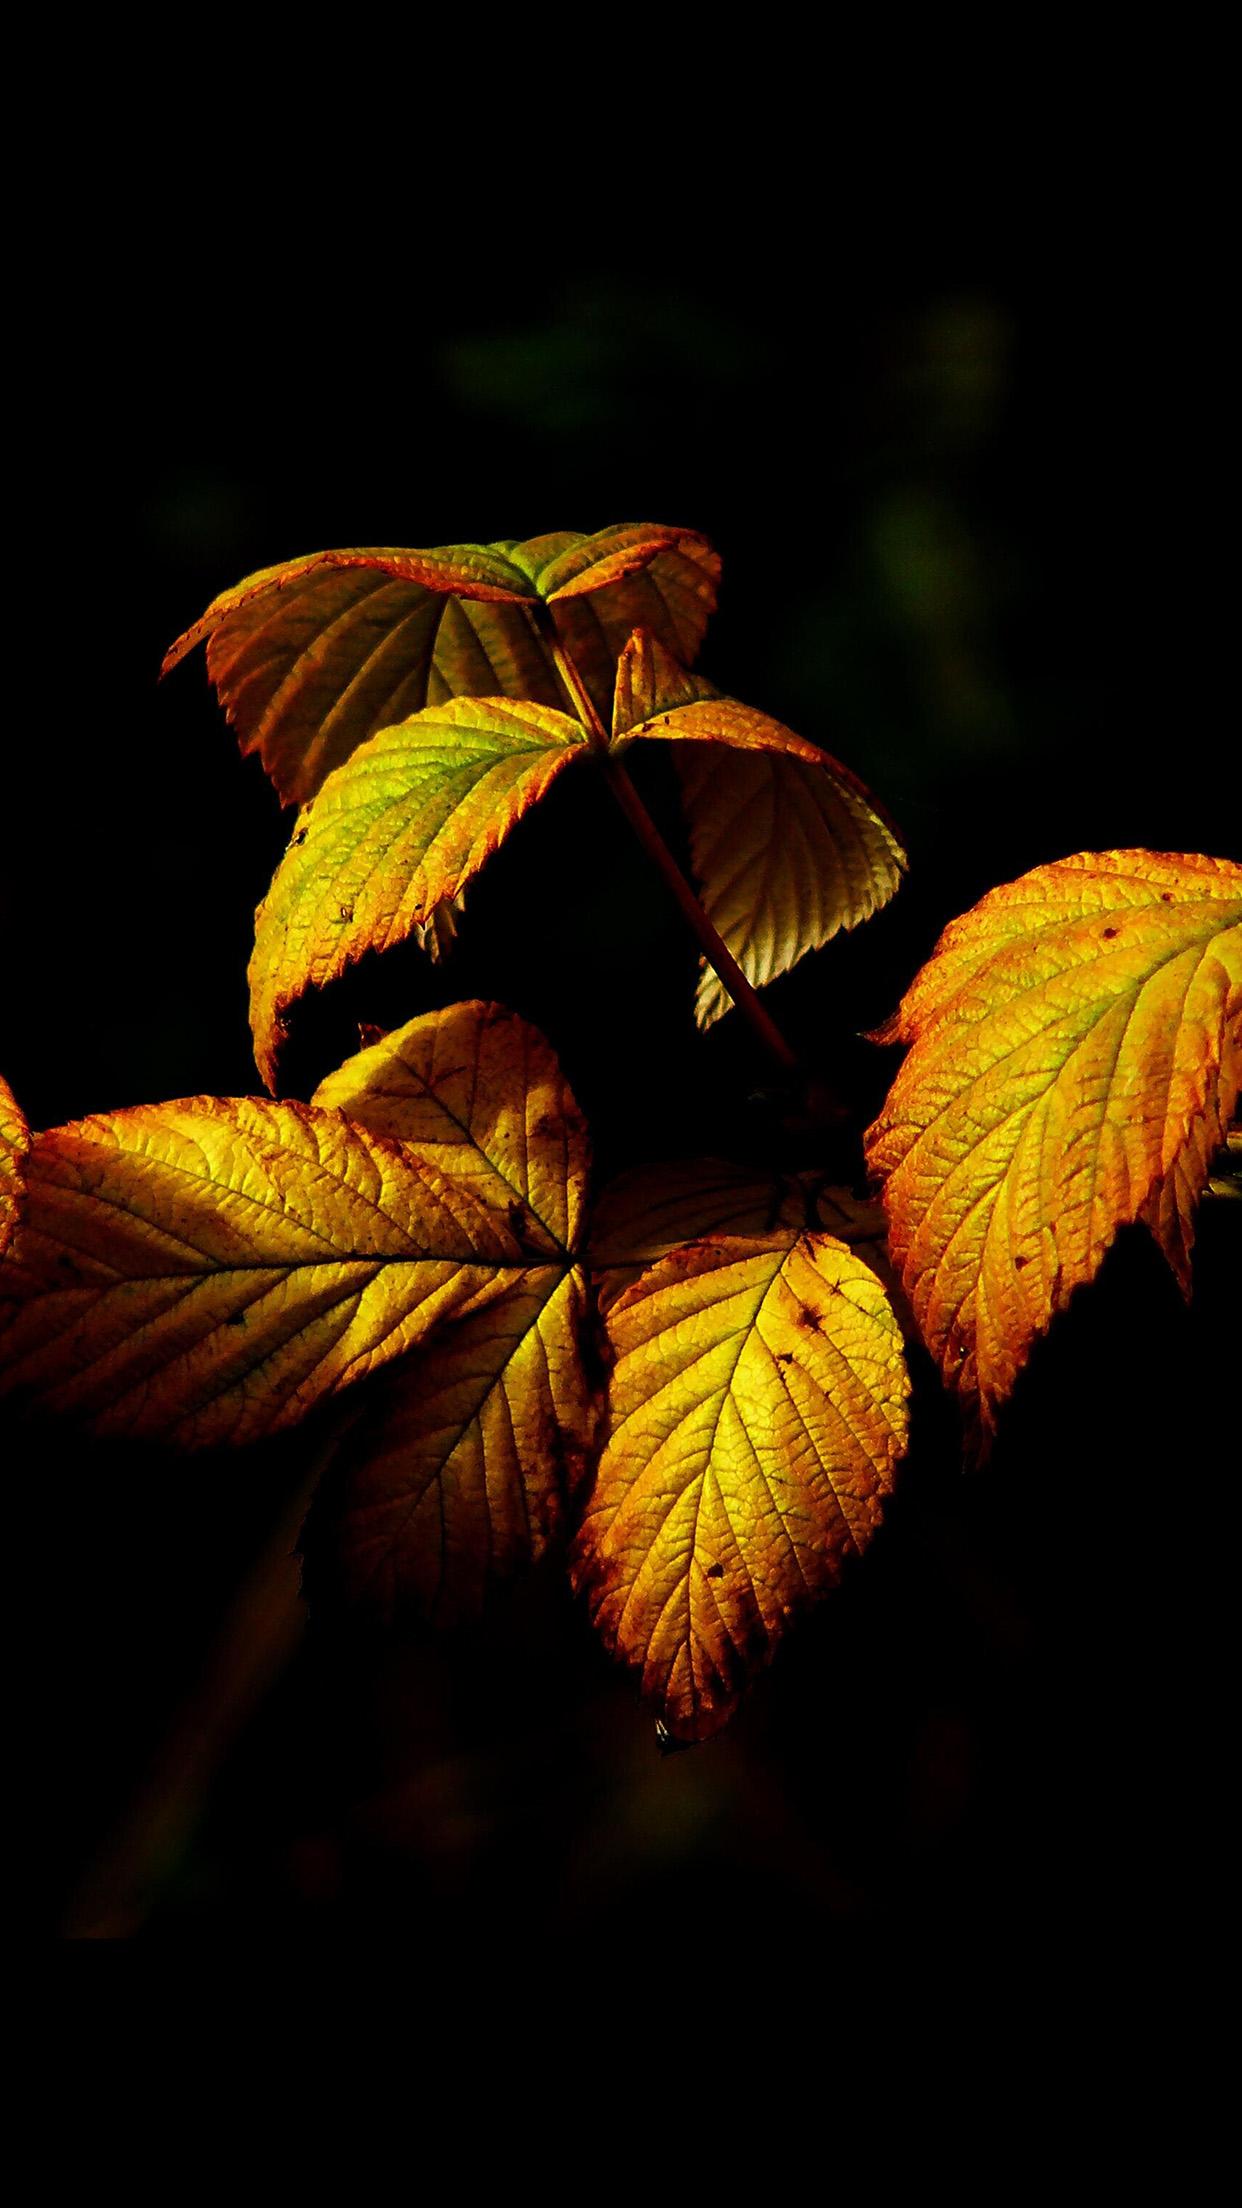 Fall Leaves Iphone 7 Wallpaper  Idrop News